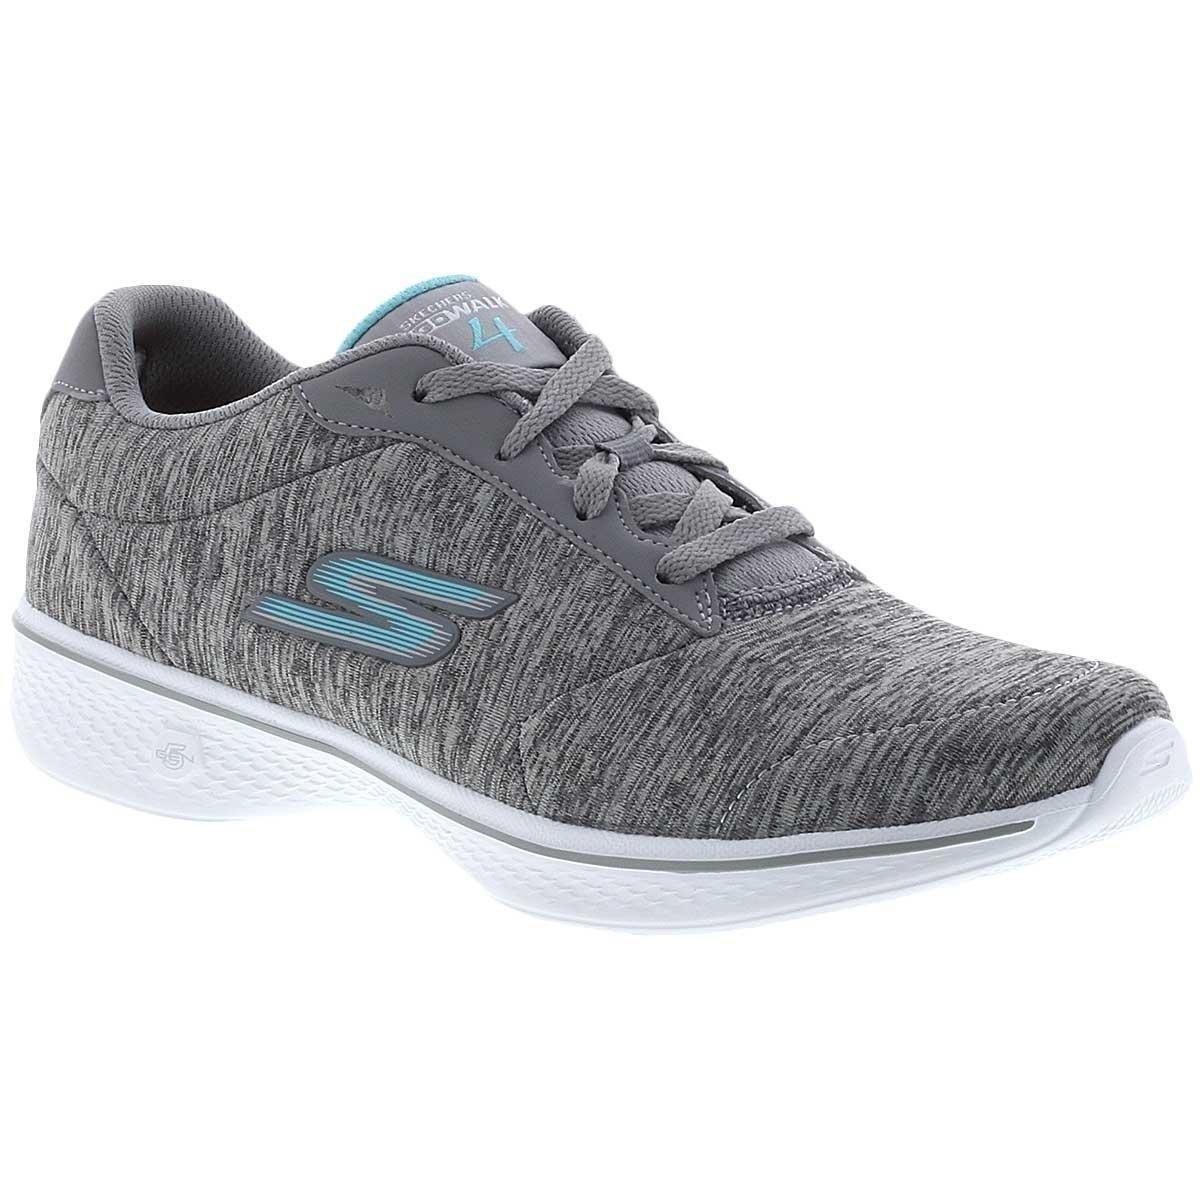 c305537425 Tênis Skechers Go Walk 4 Feminino | Zattini